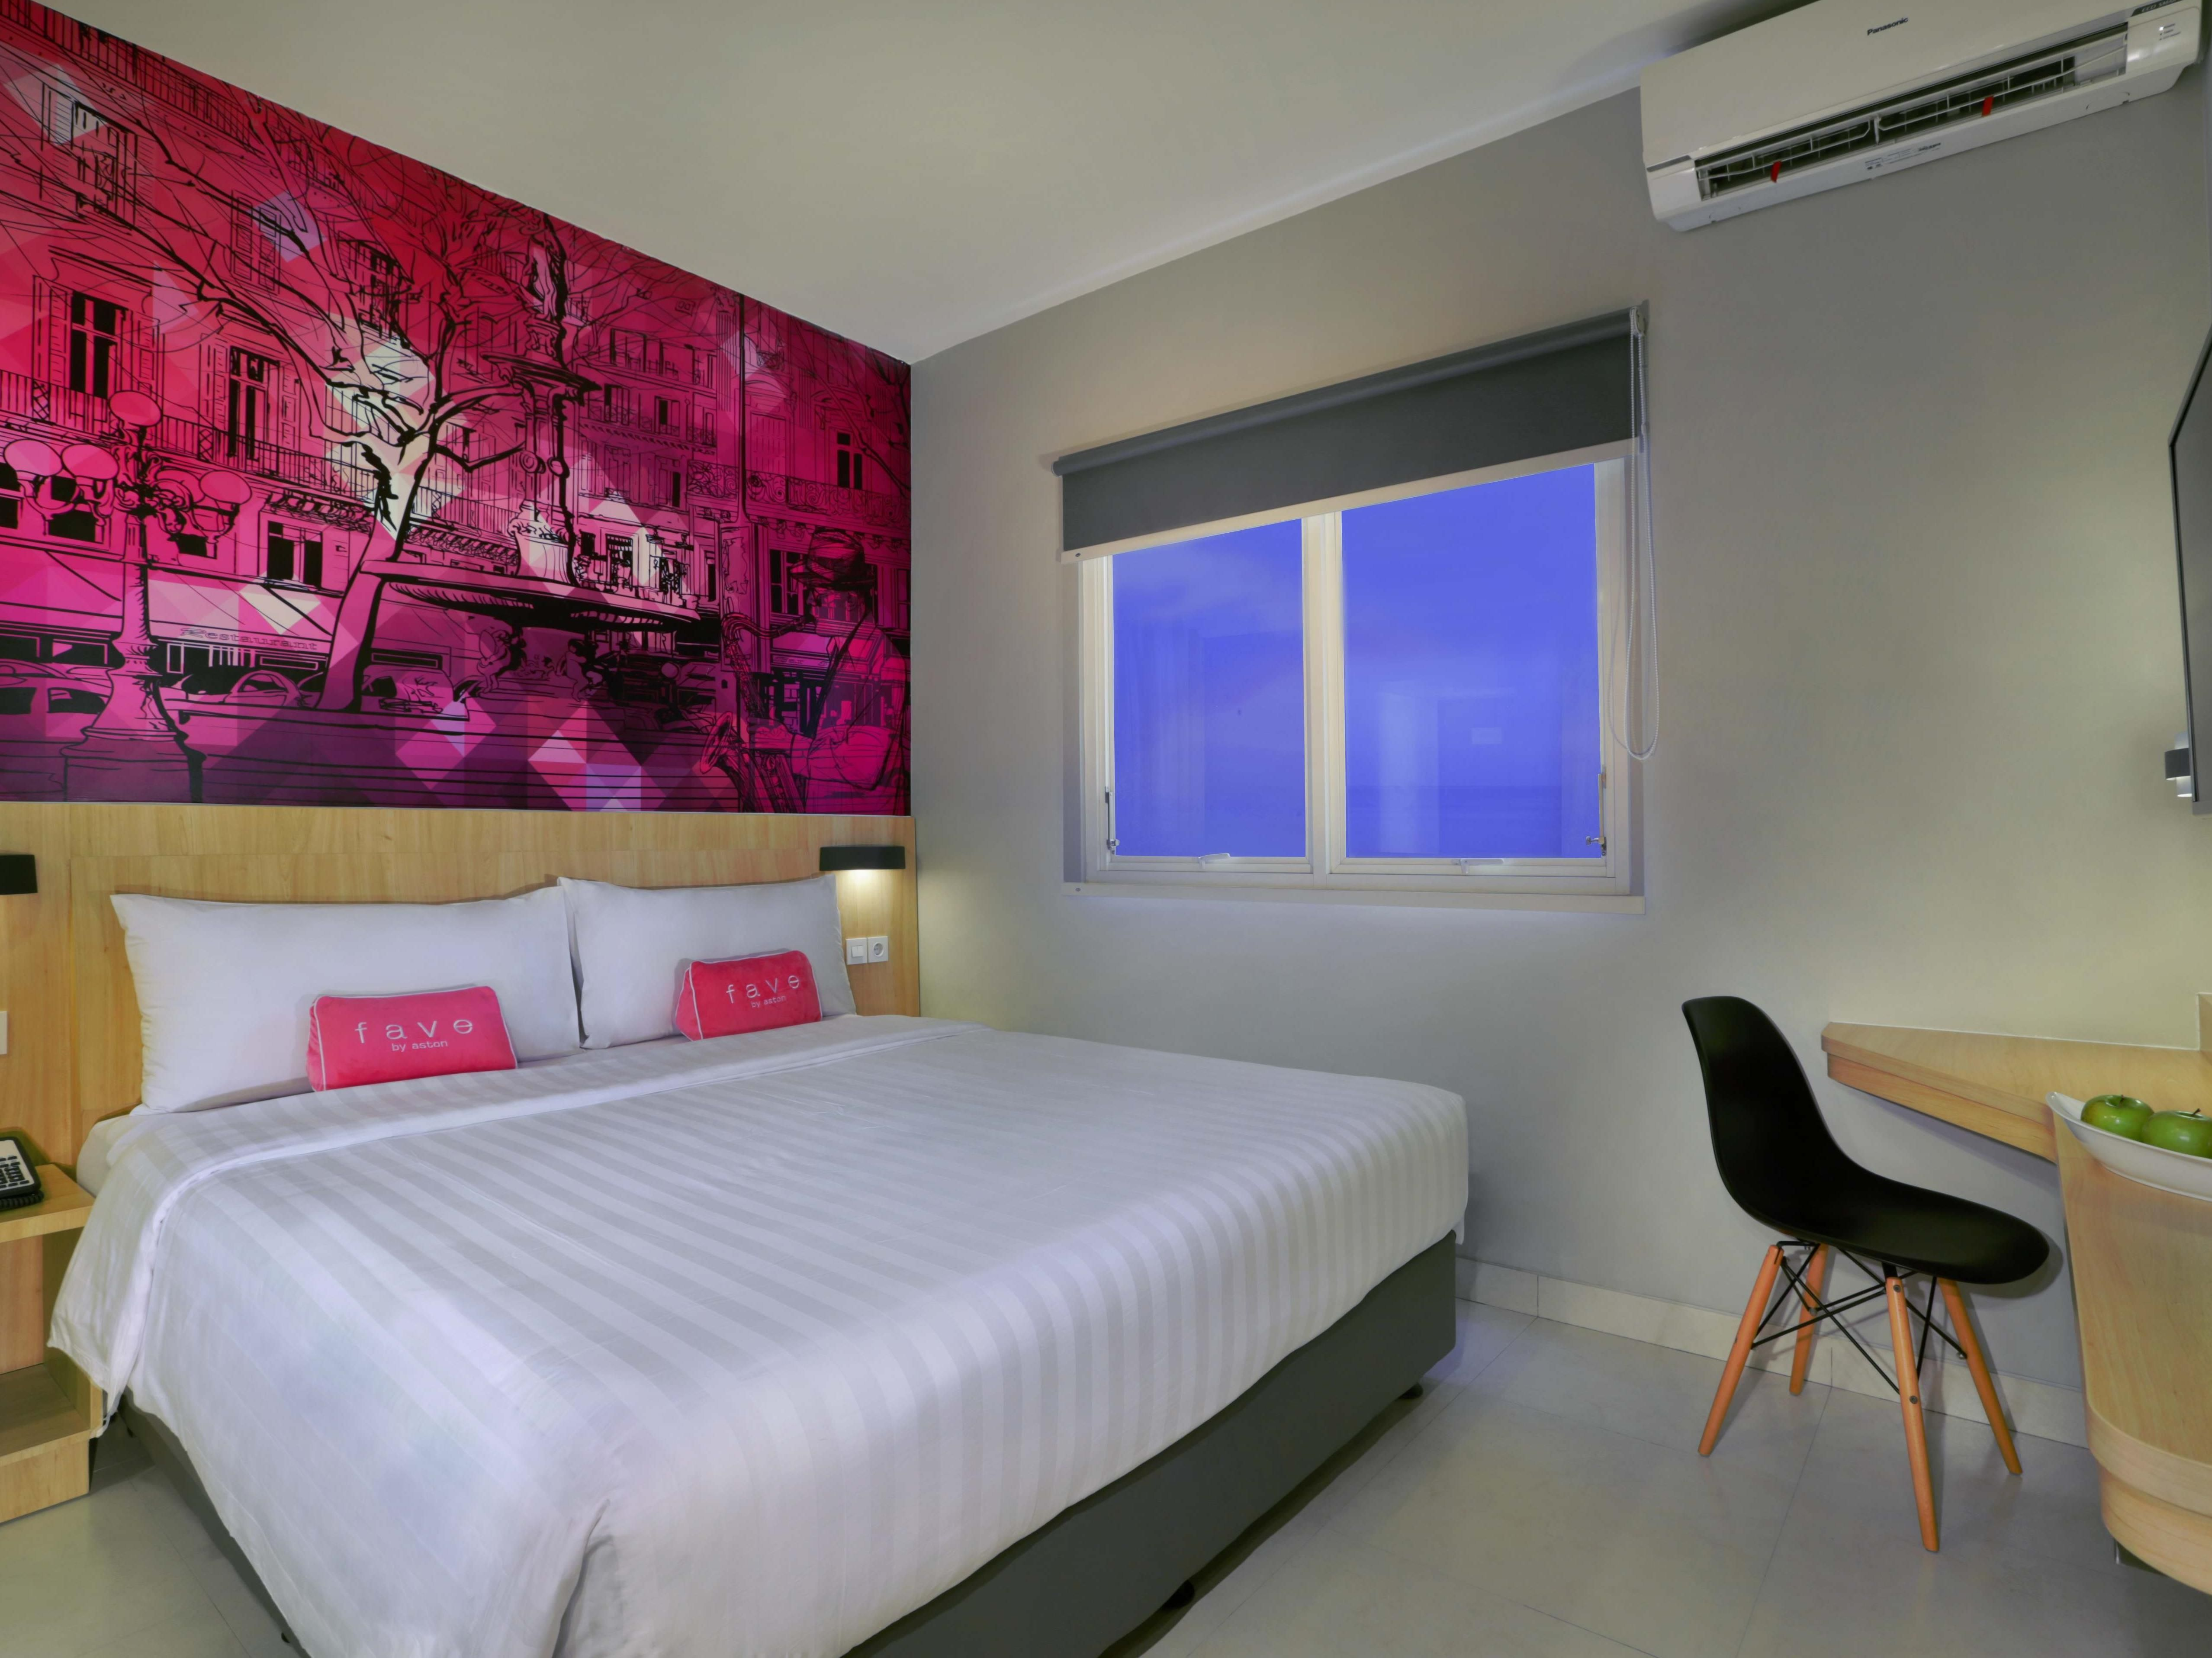 Favehotel Ahmad Yani Banjarmasin Banjarmasin, Indonesia